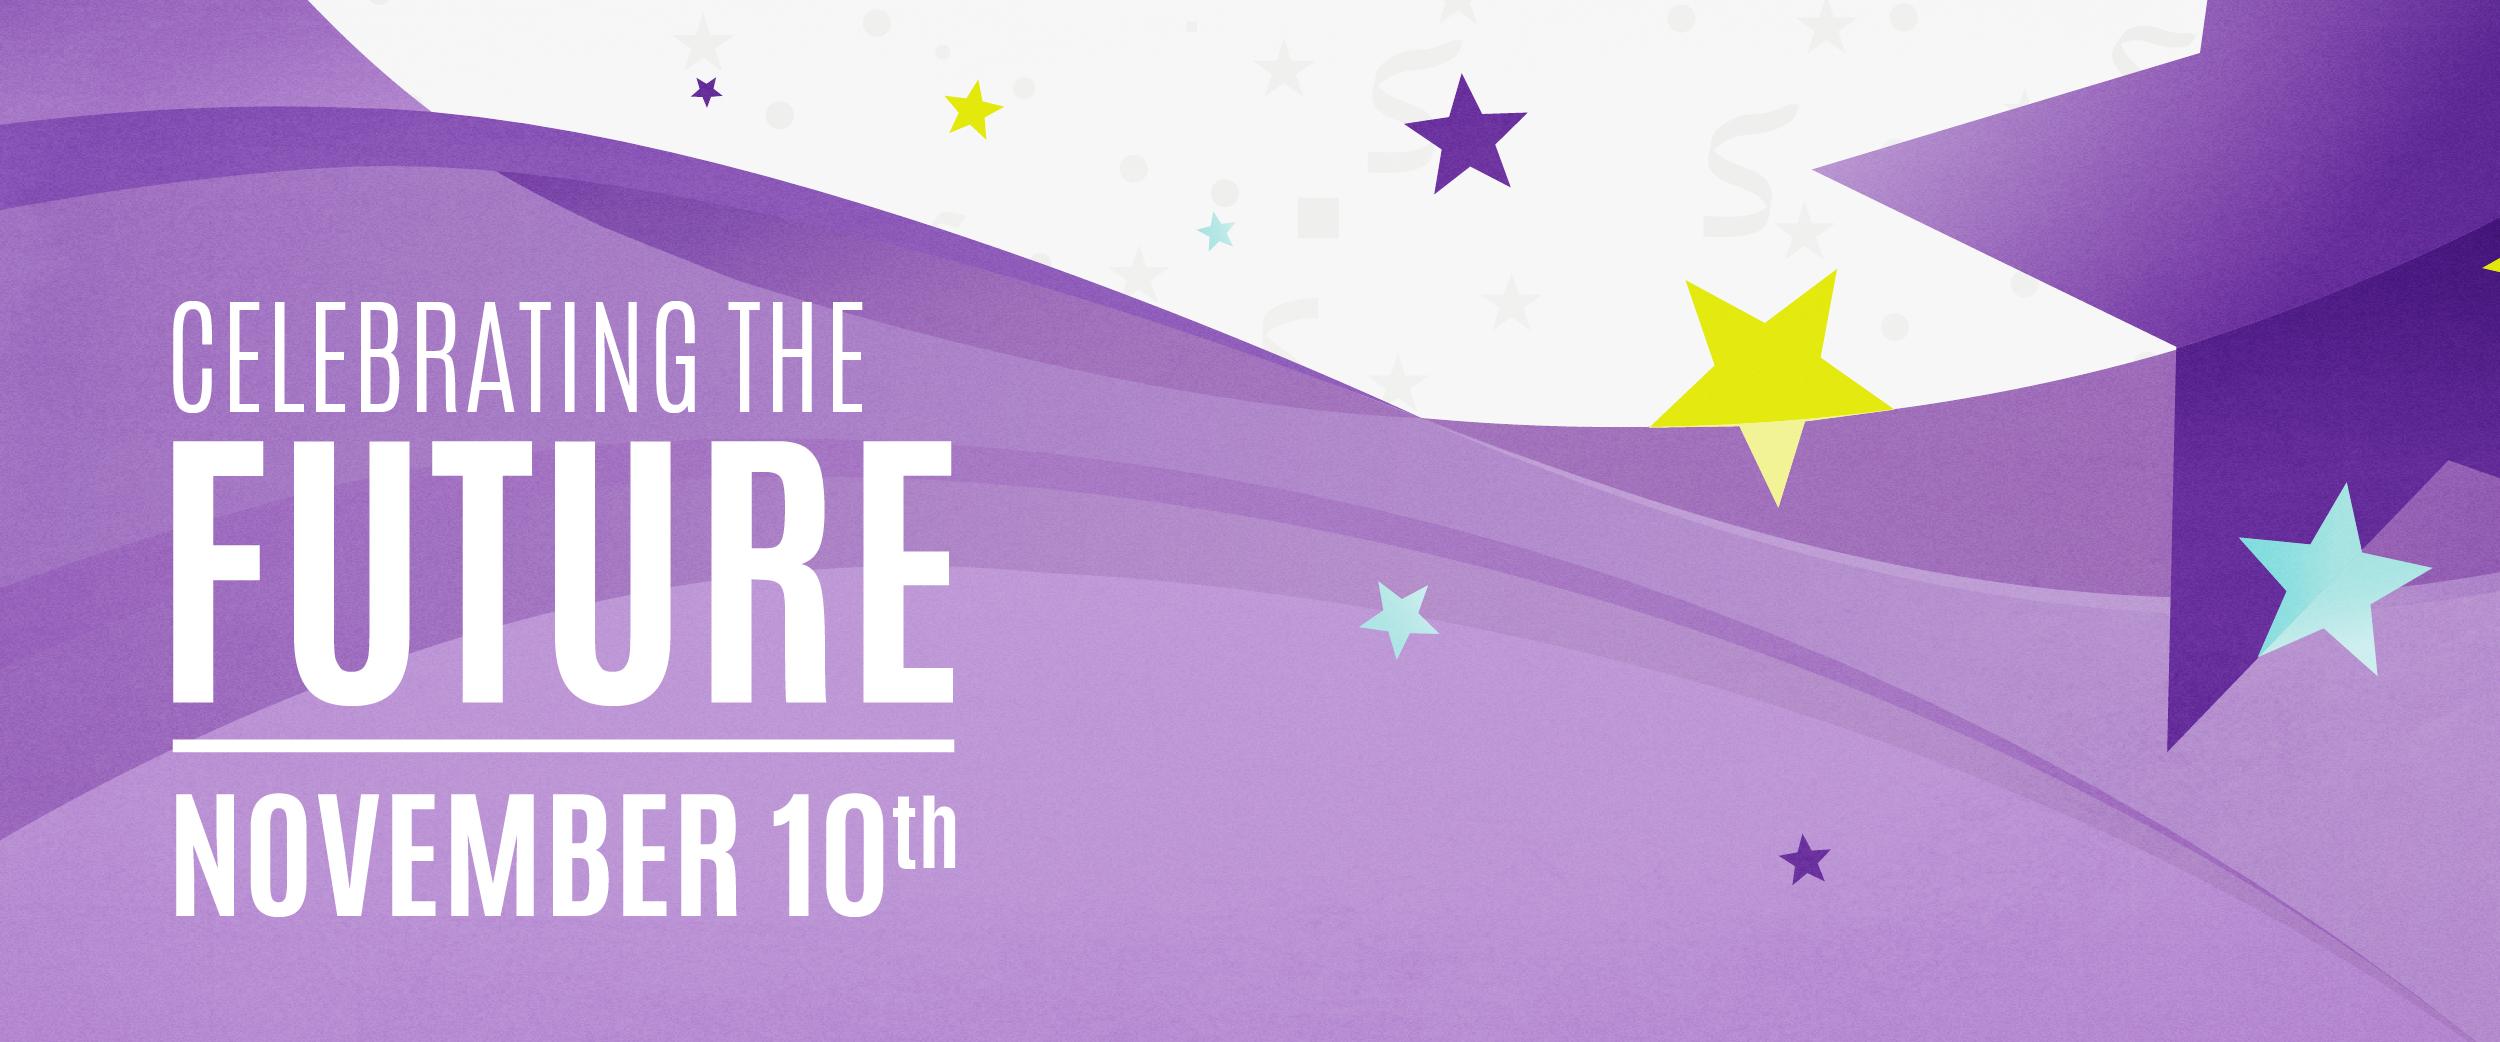 JSO18.19_Banners_ConcertPage_CelebratingTheFuture.jpg